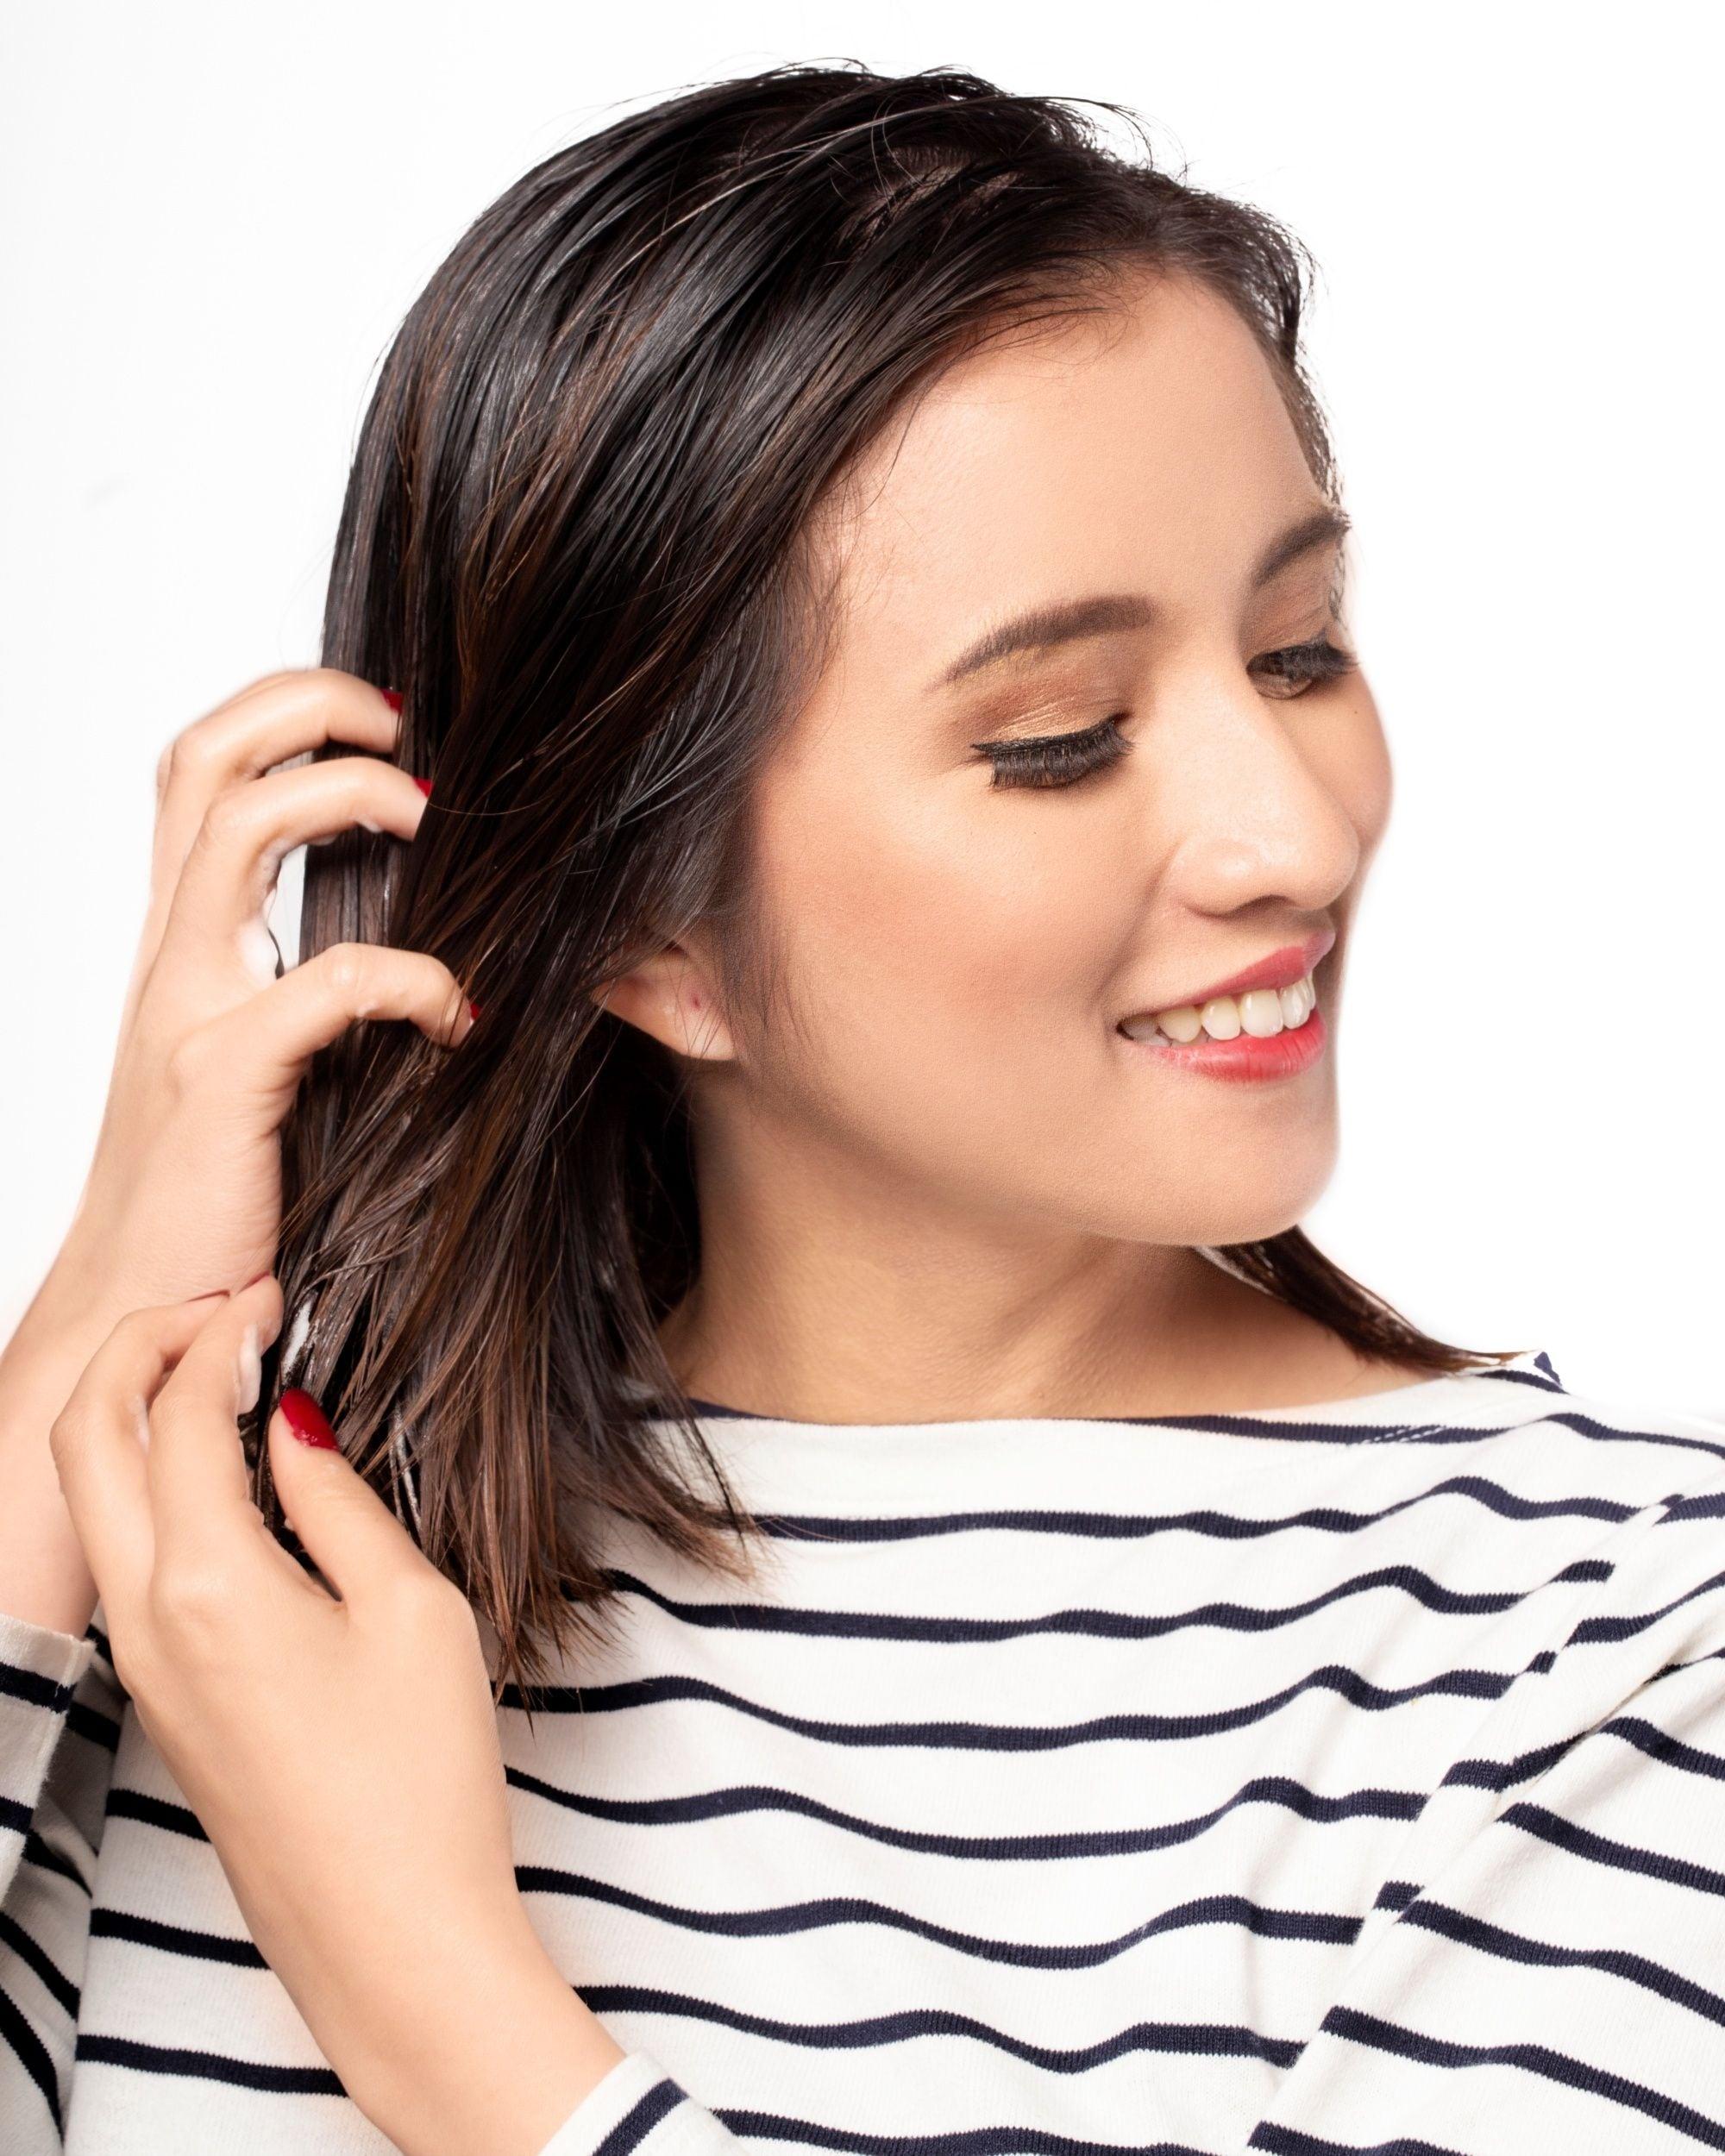 Brush your hair the right way: Closeup shot of an Asian woman finger-combing her short dark hair